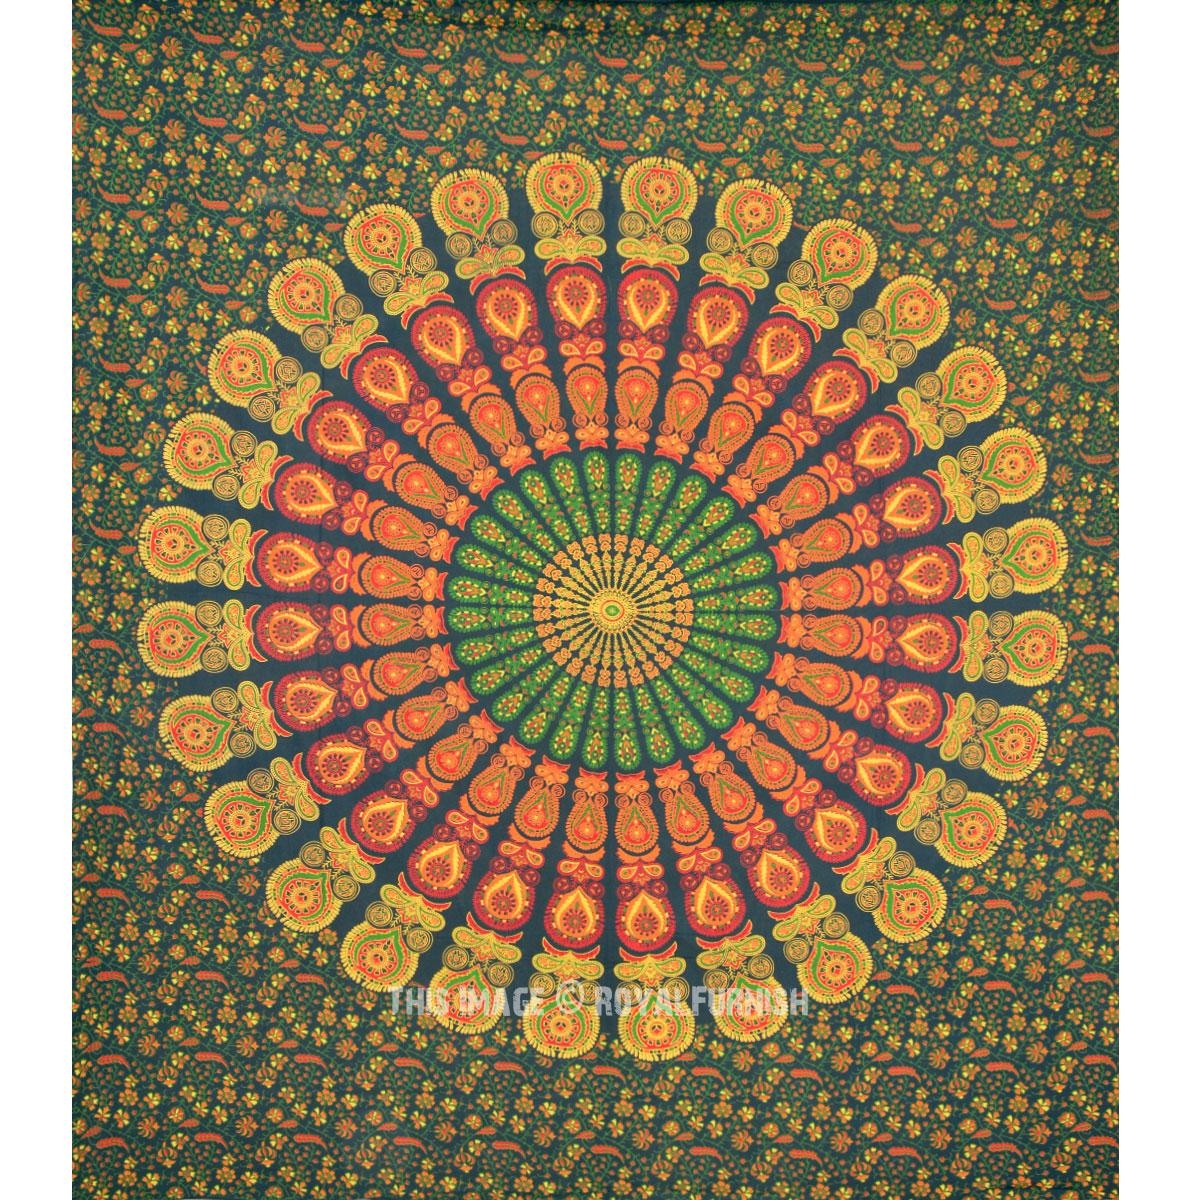 Indian Mandala Hippie Bohemian Tapestry Coverlet - RoyalFurnish.com